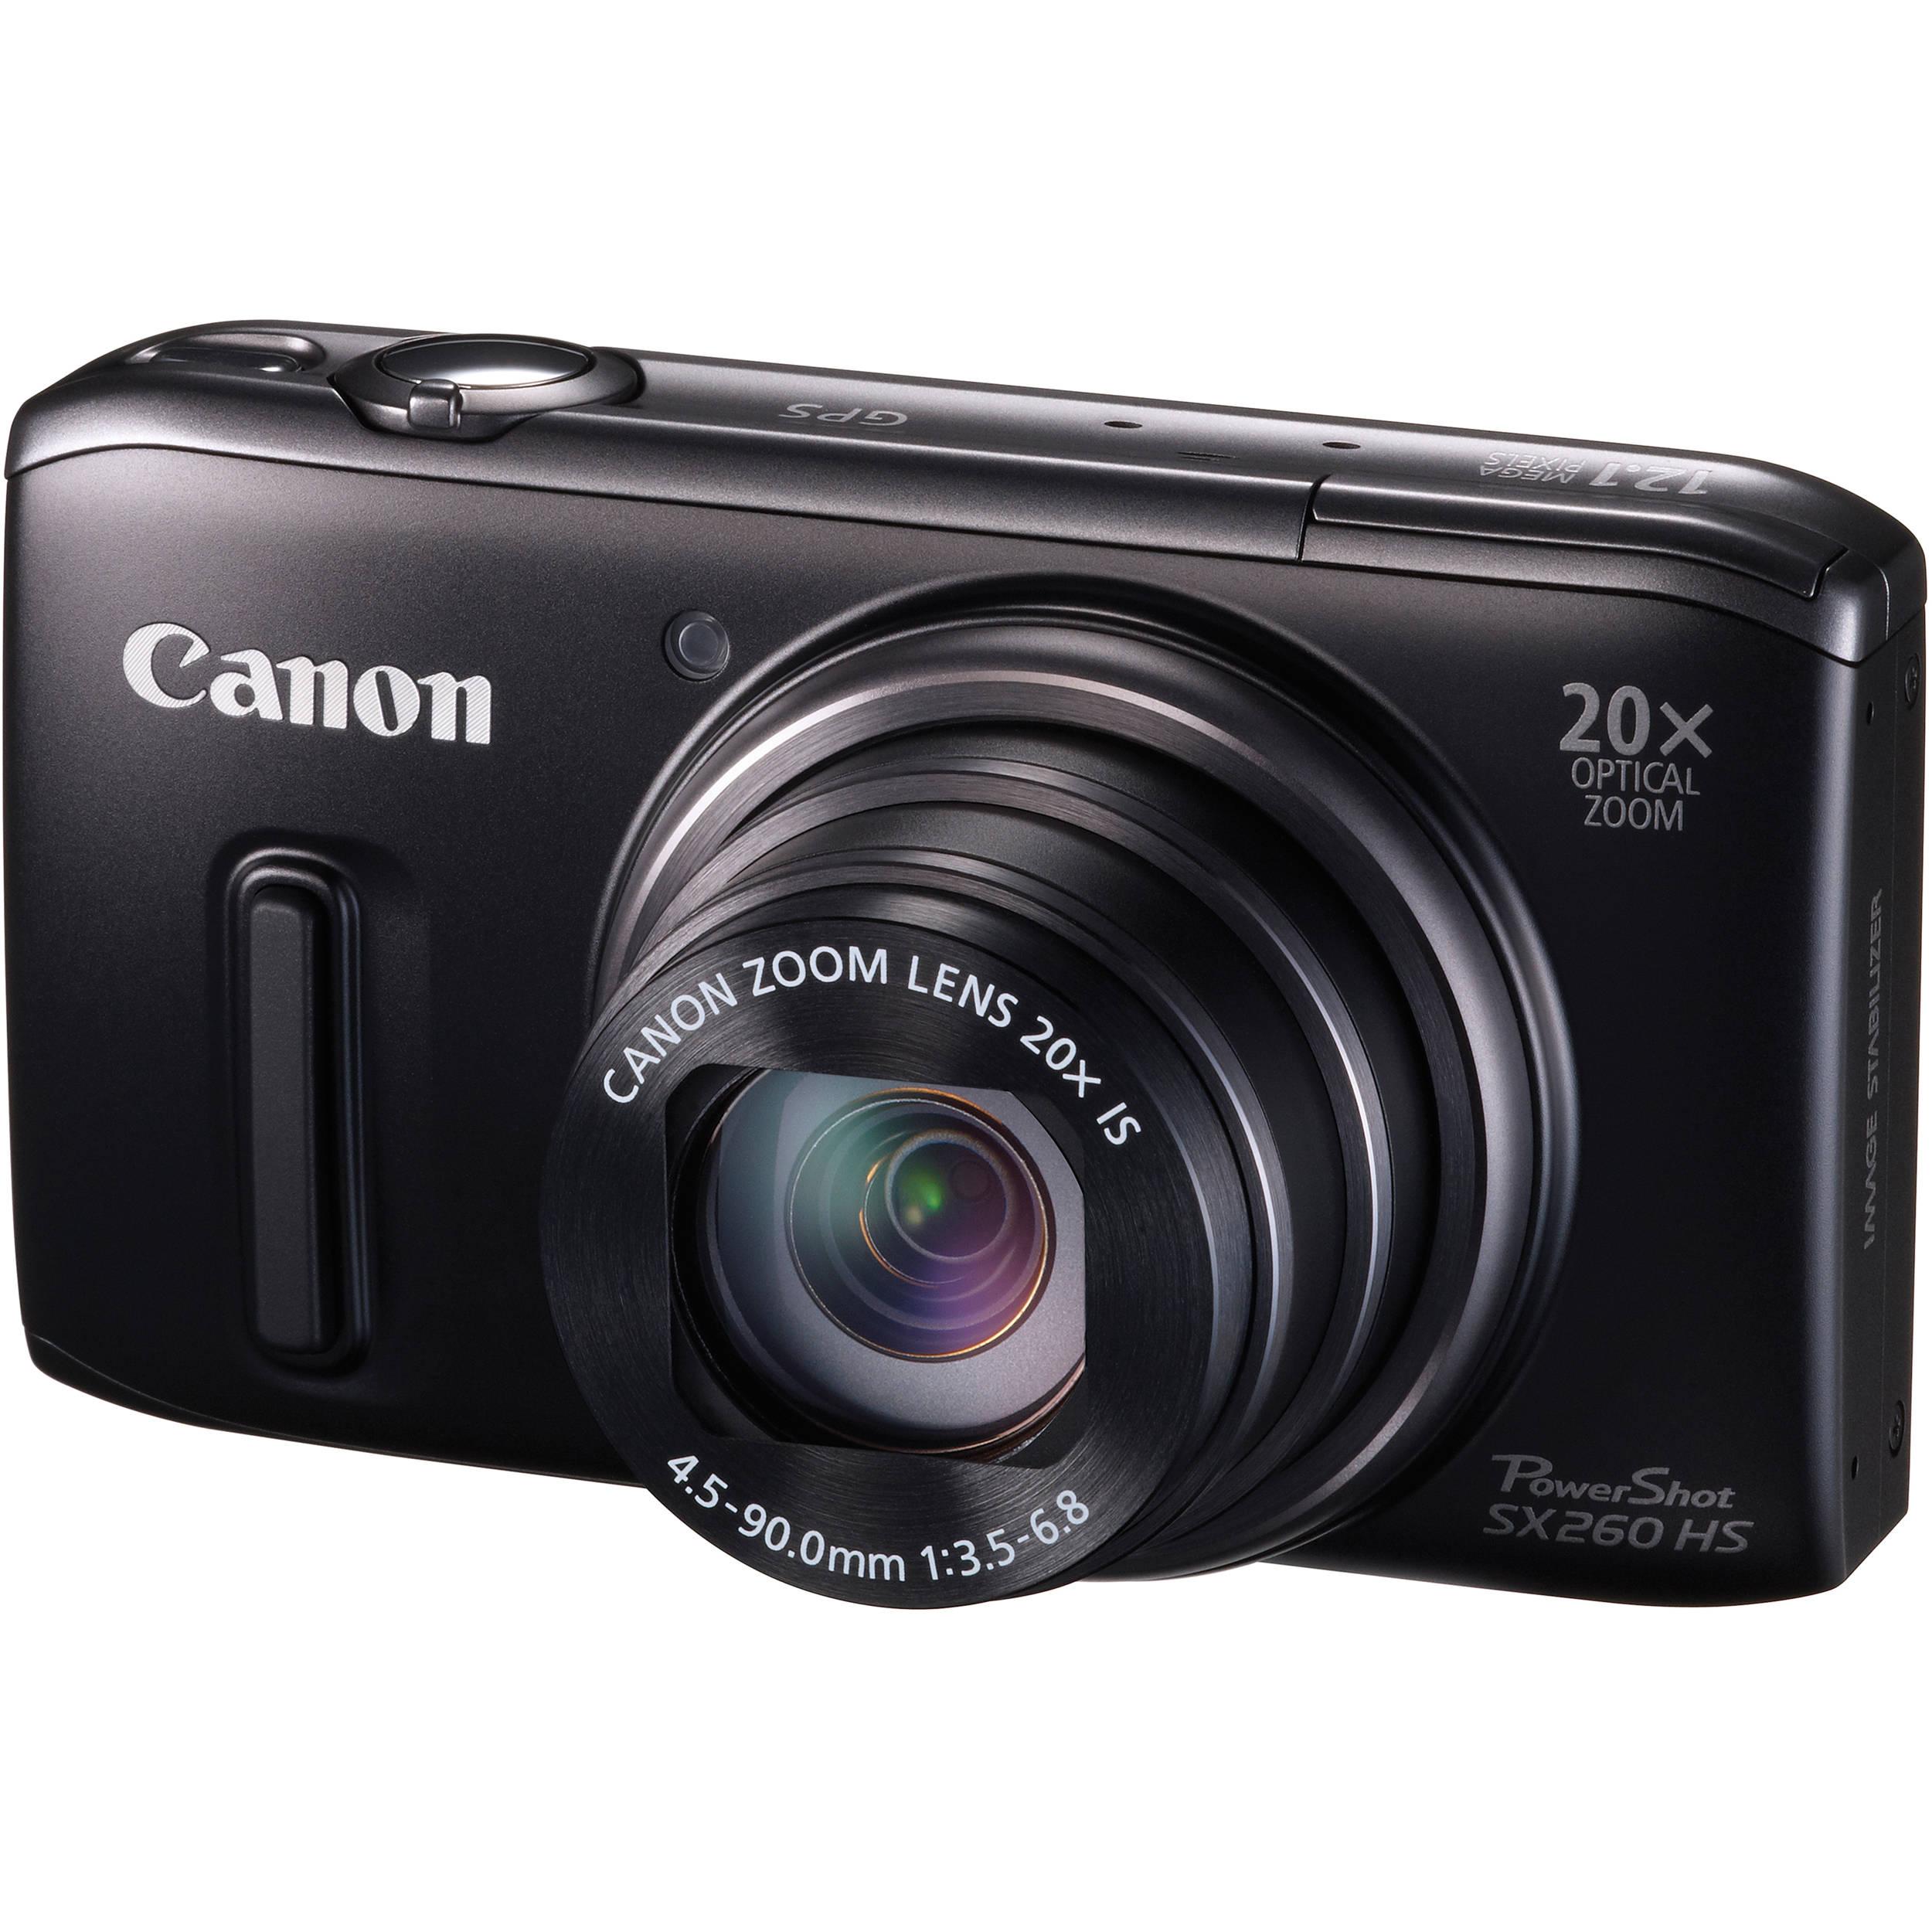 Canon PowerShot SX260 HS Digital Camera (Black) 5900B001 B&H